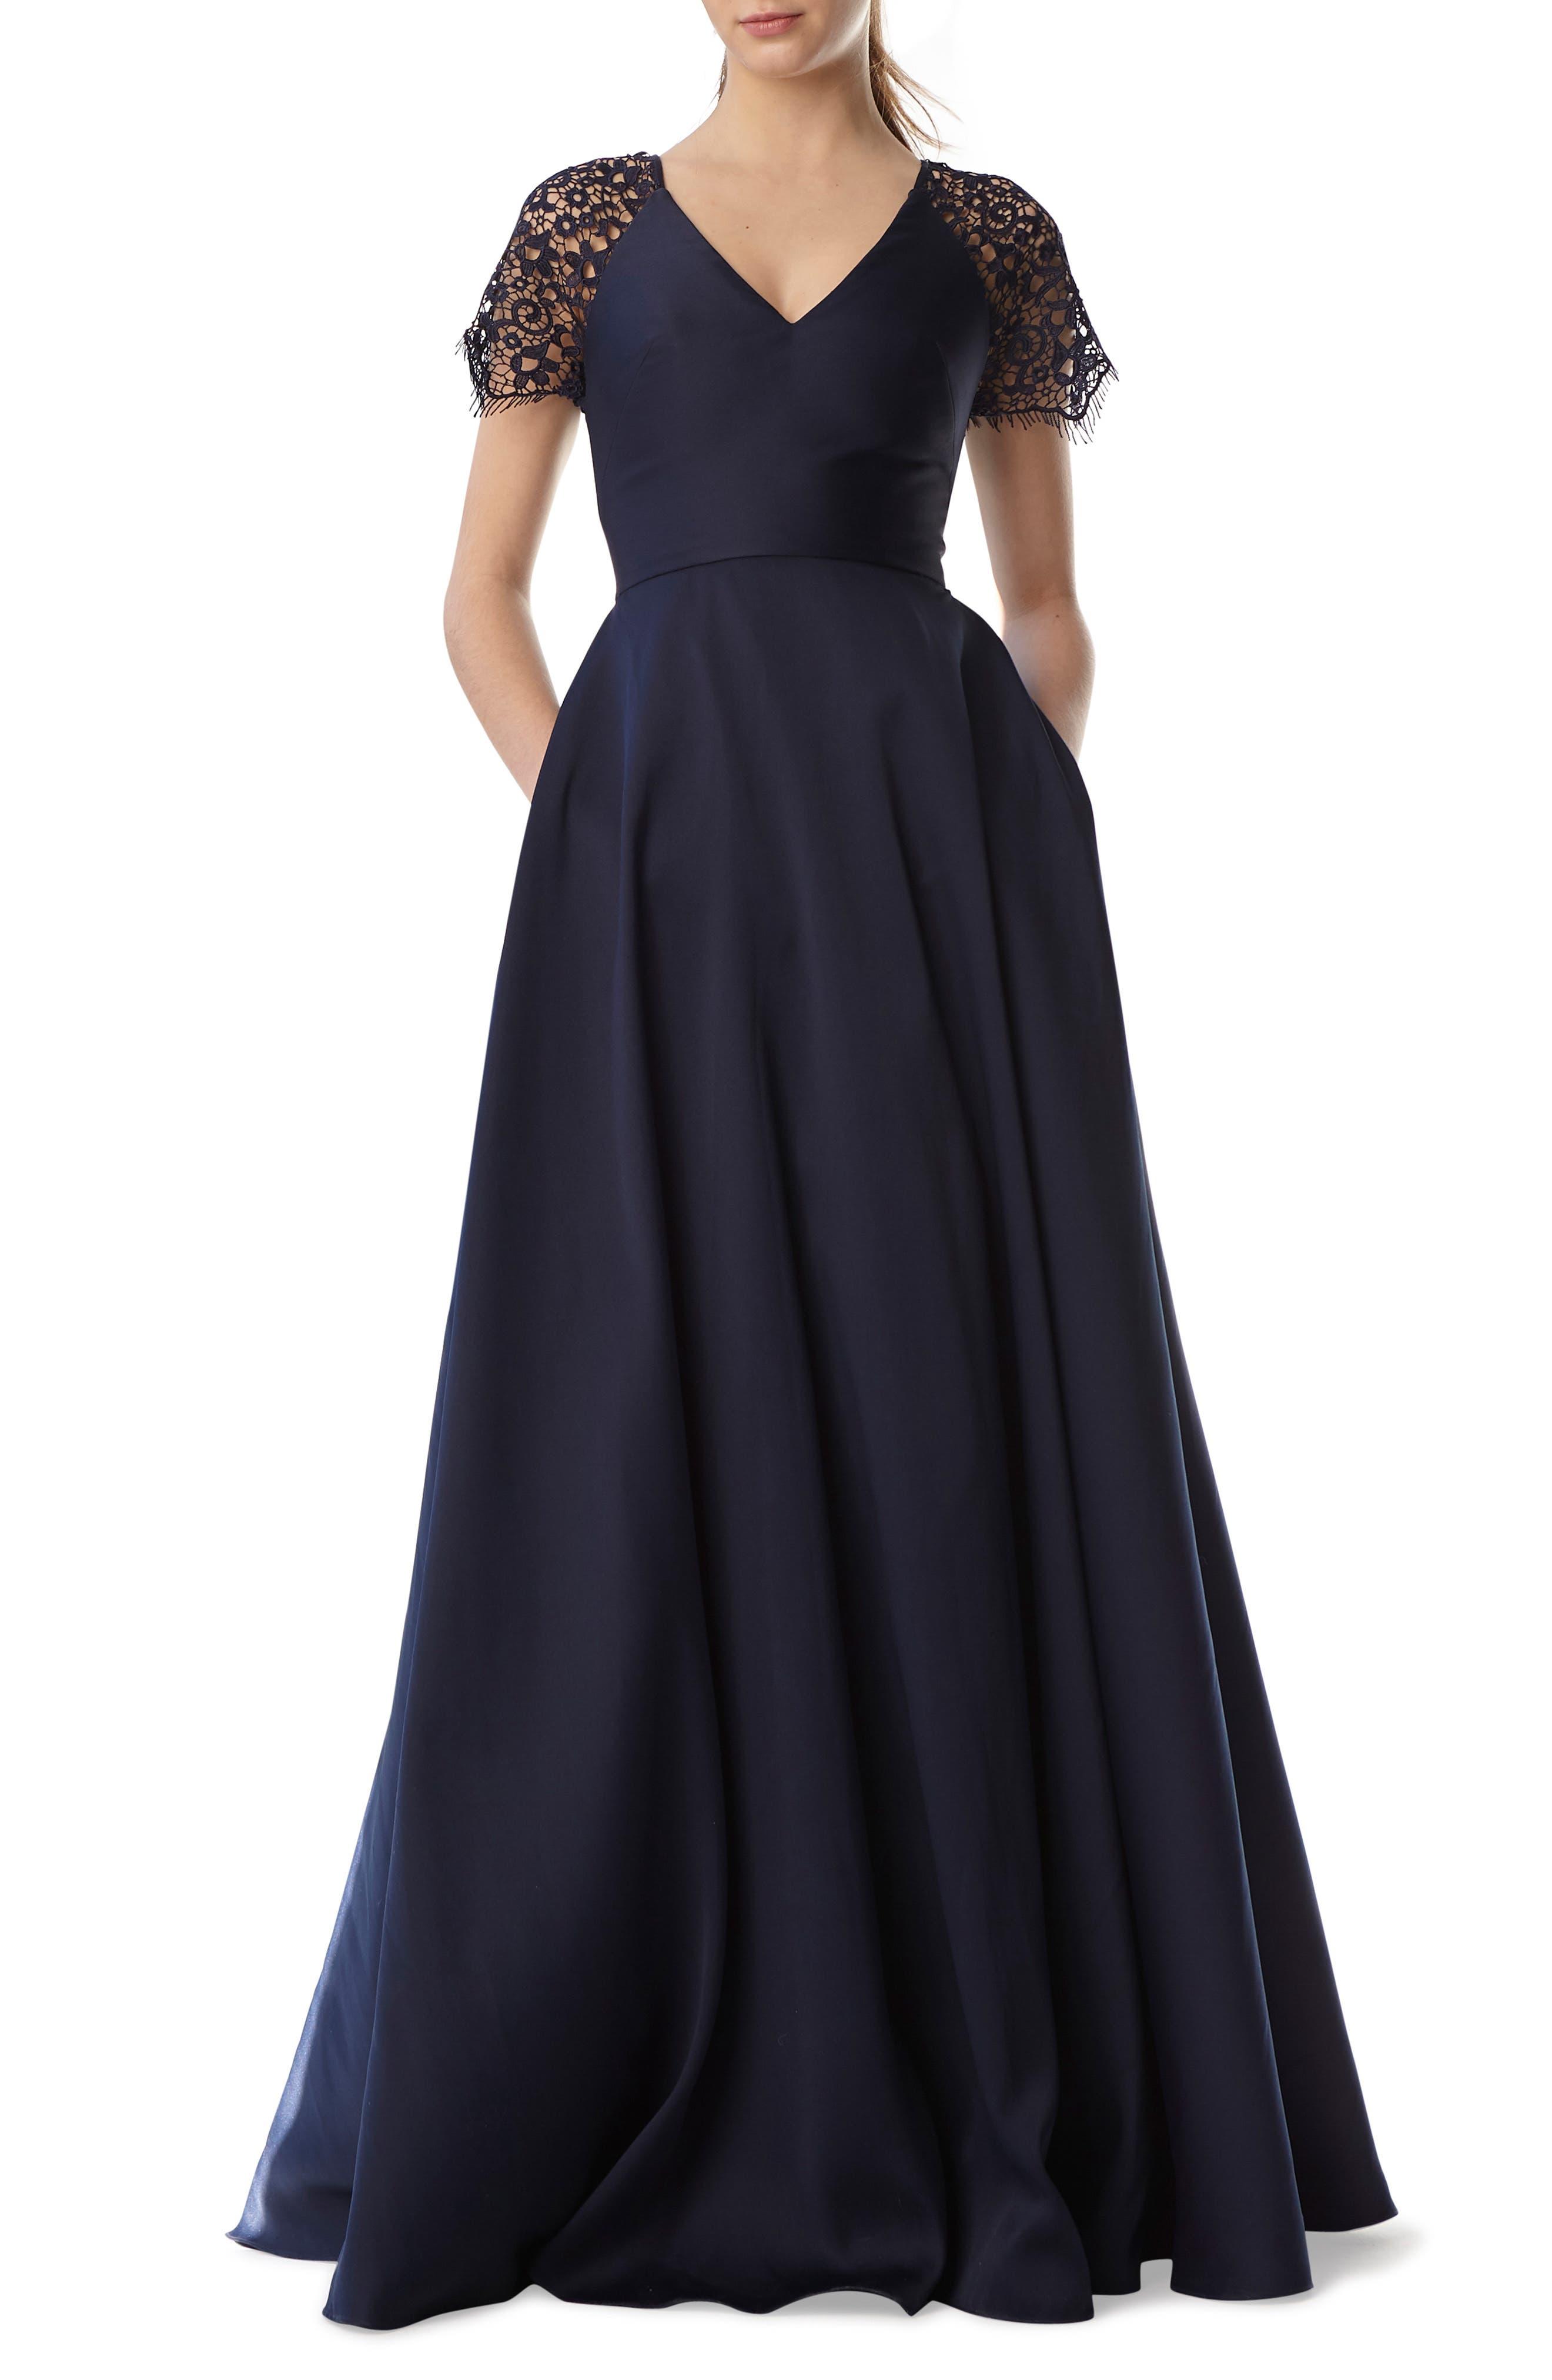 Ml Monique Lhuillier Lace Sleeve Ball Gown, Blue